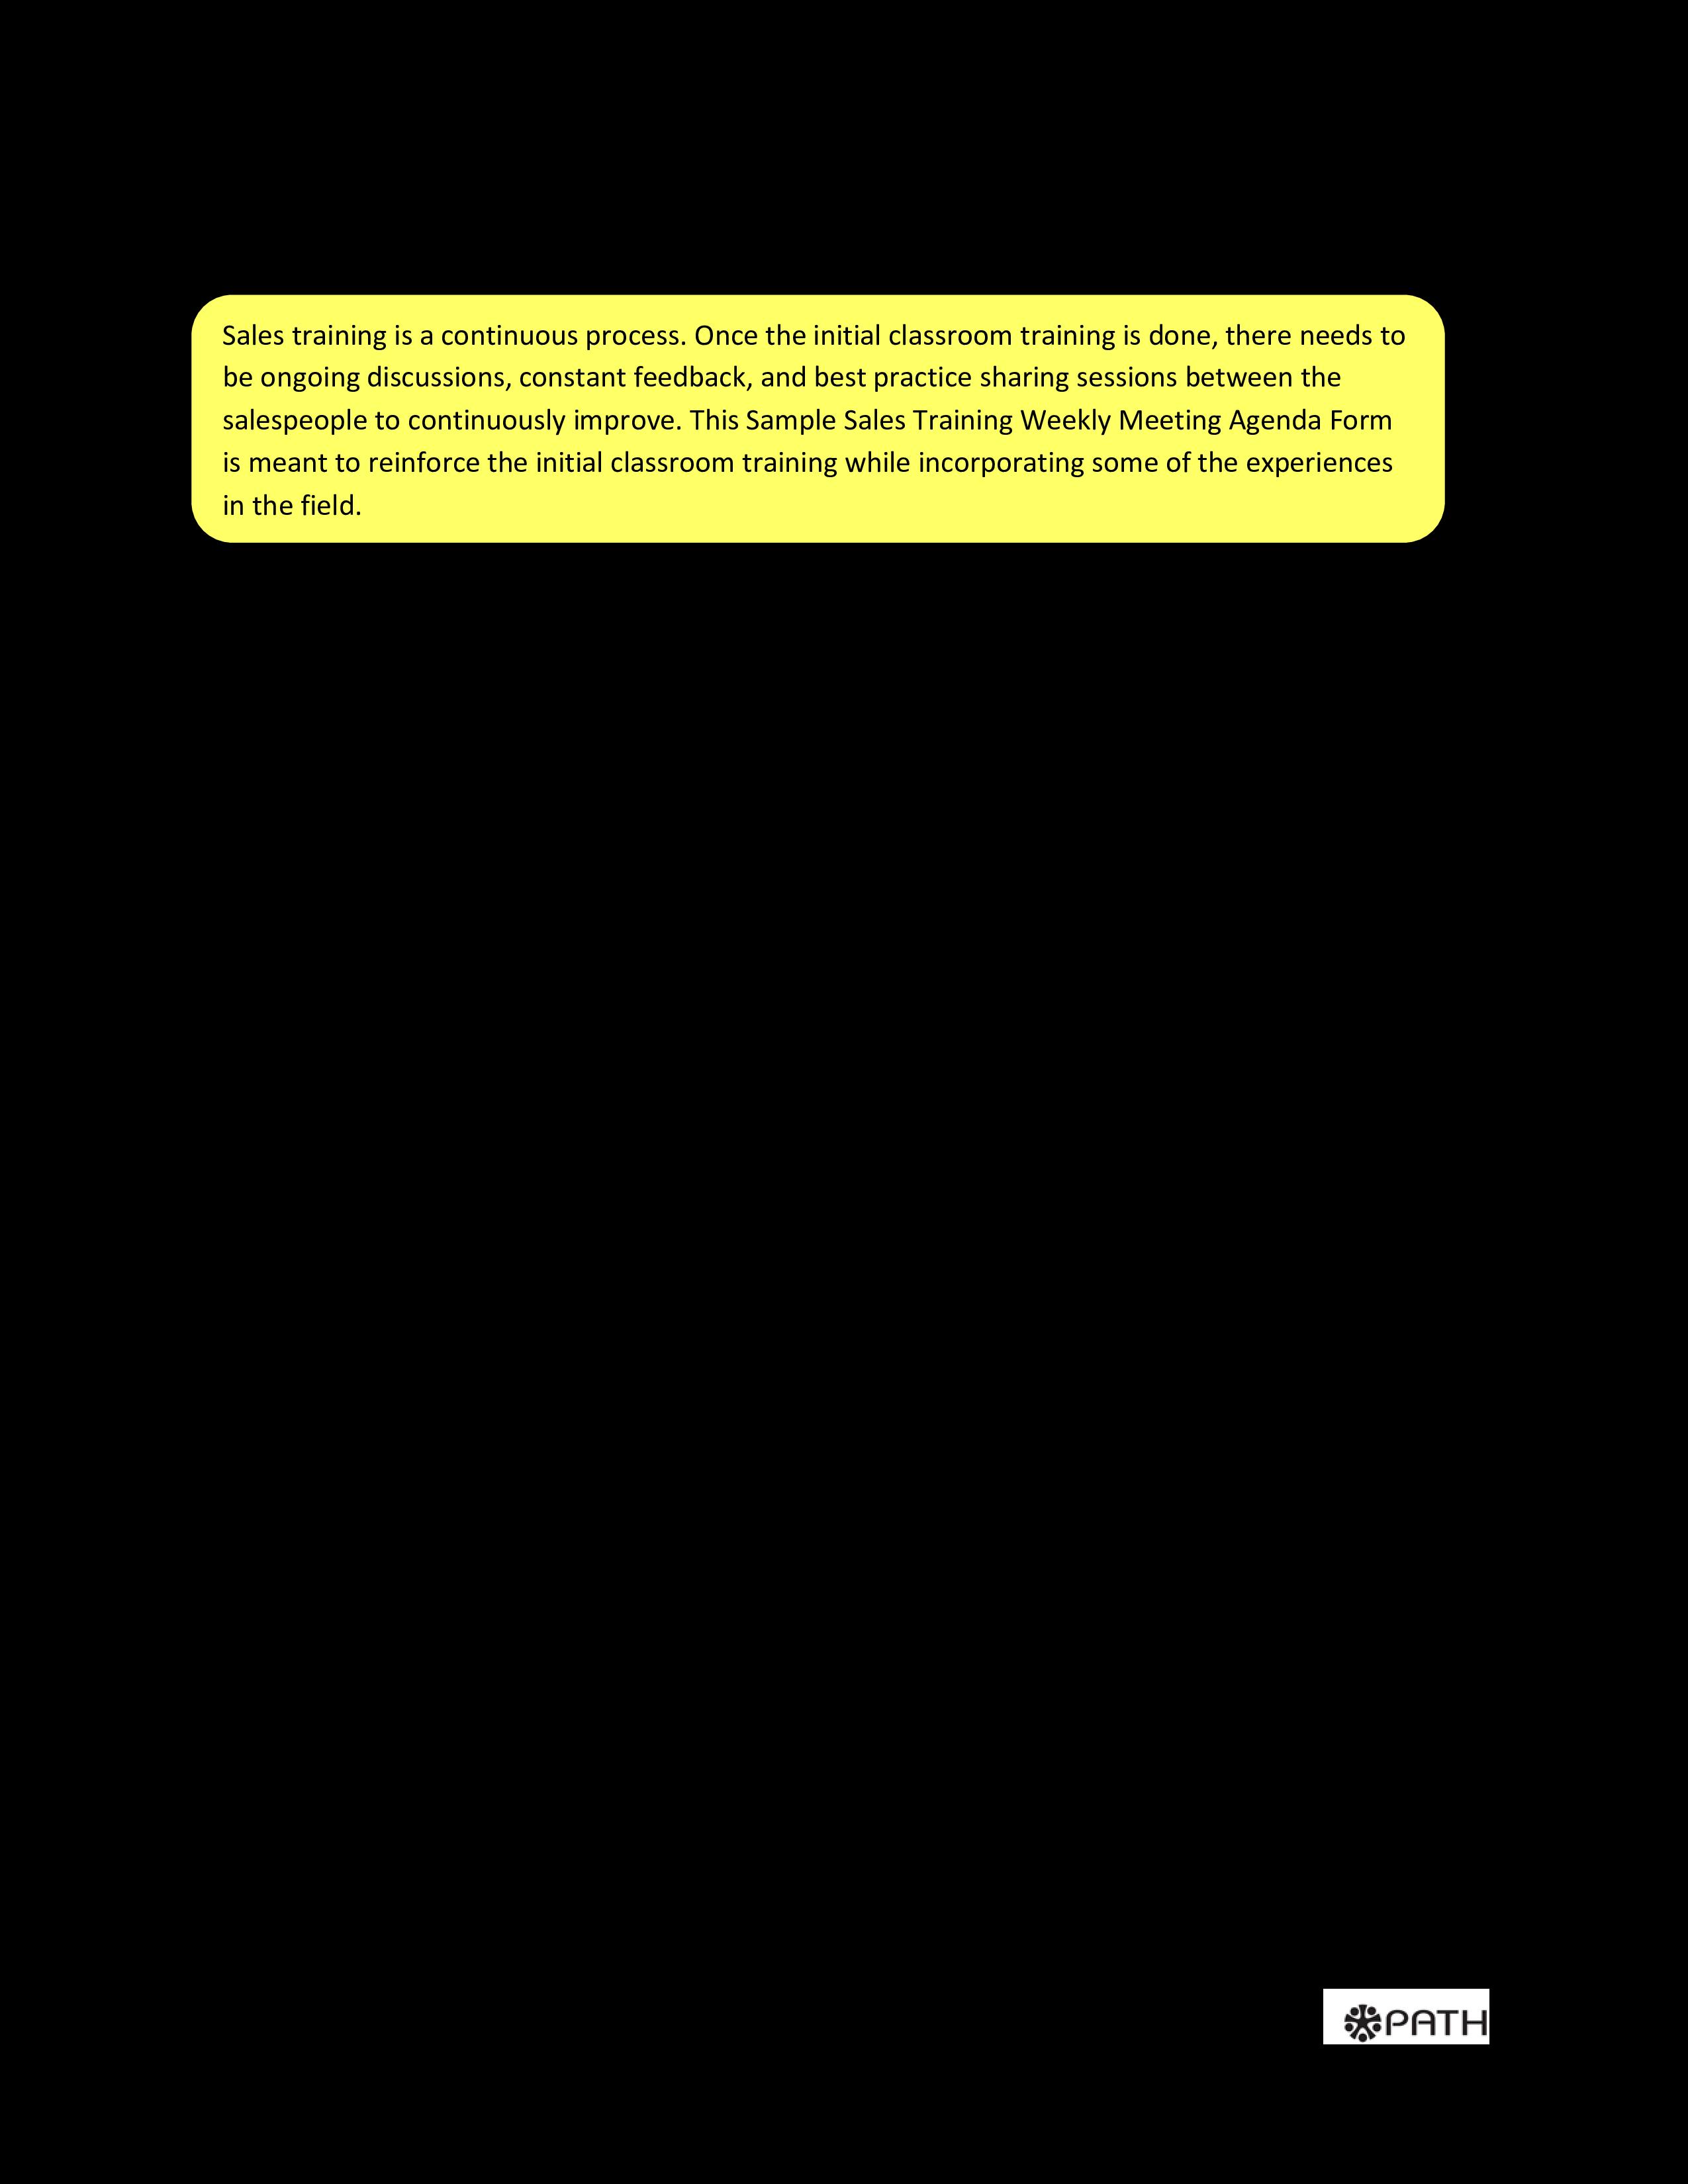 free field sales training agenda templates at